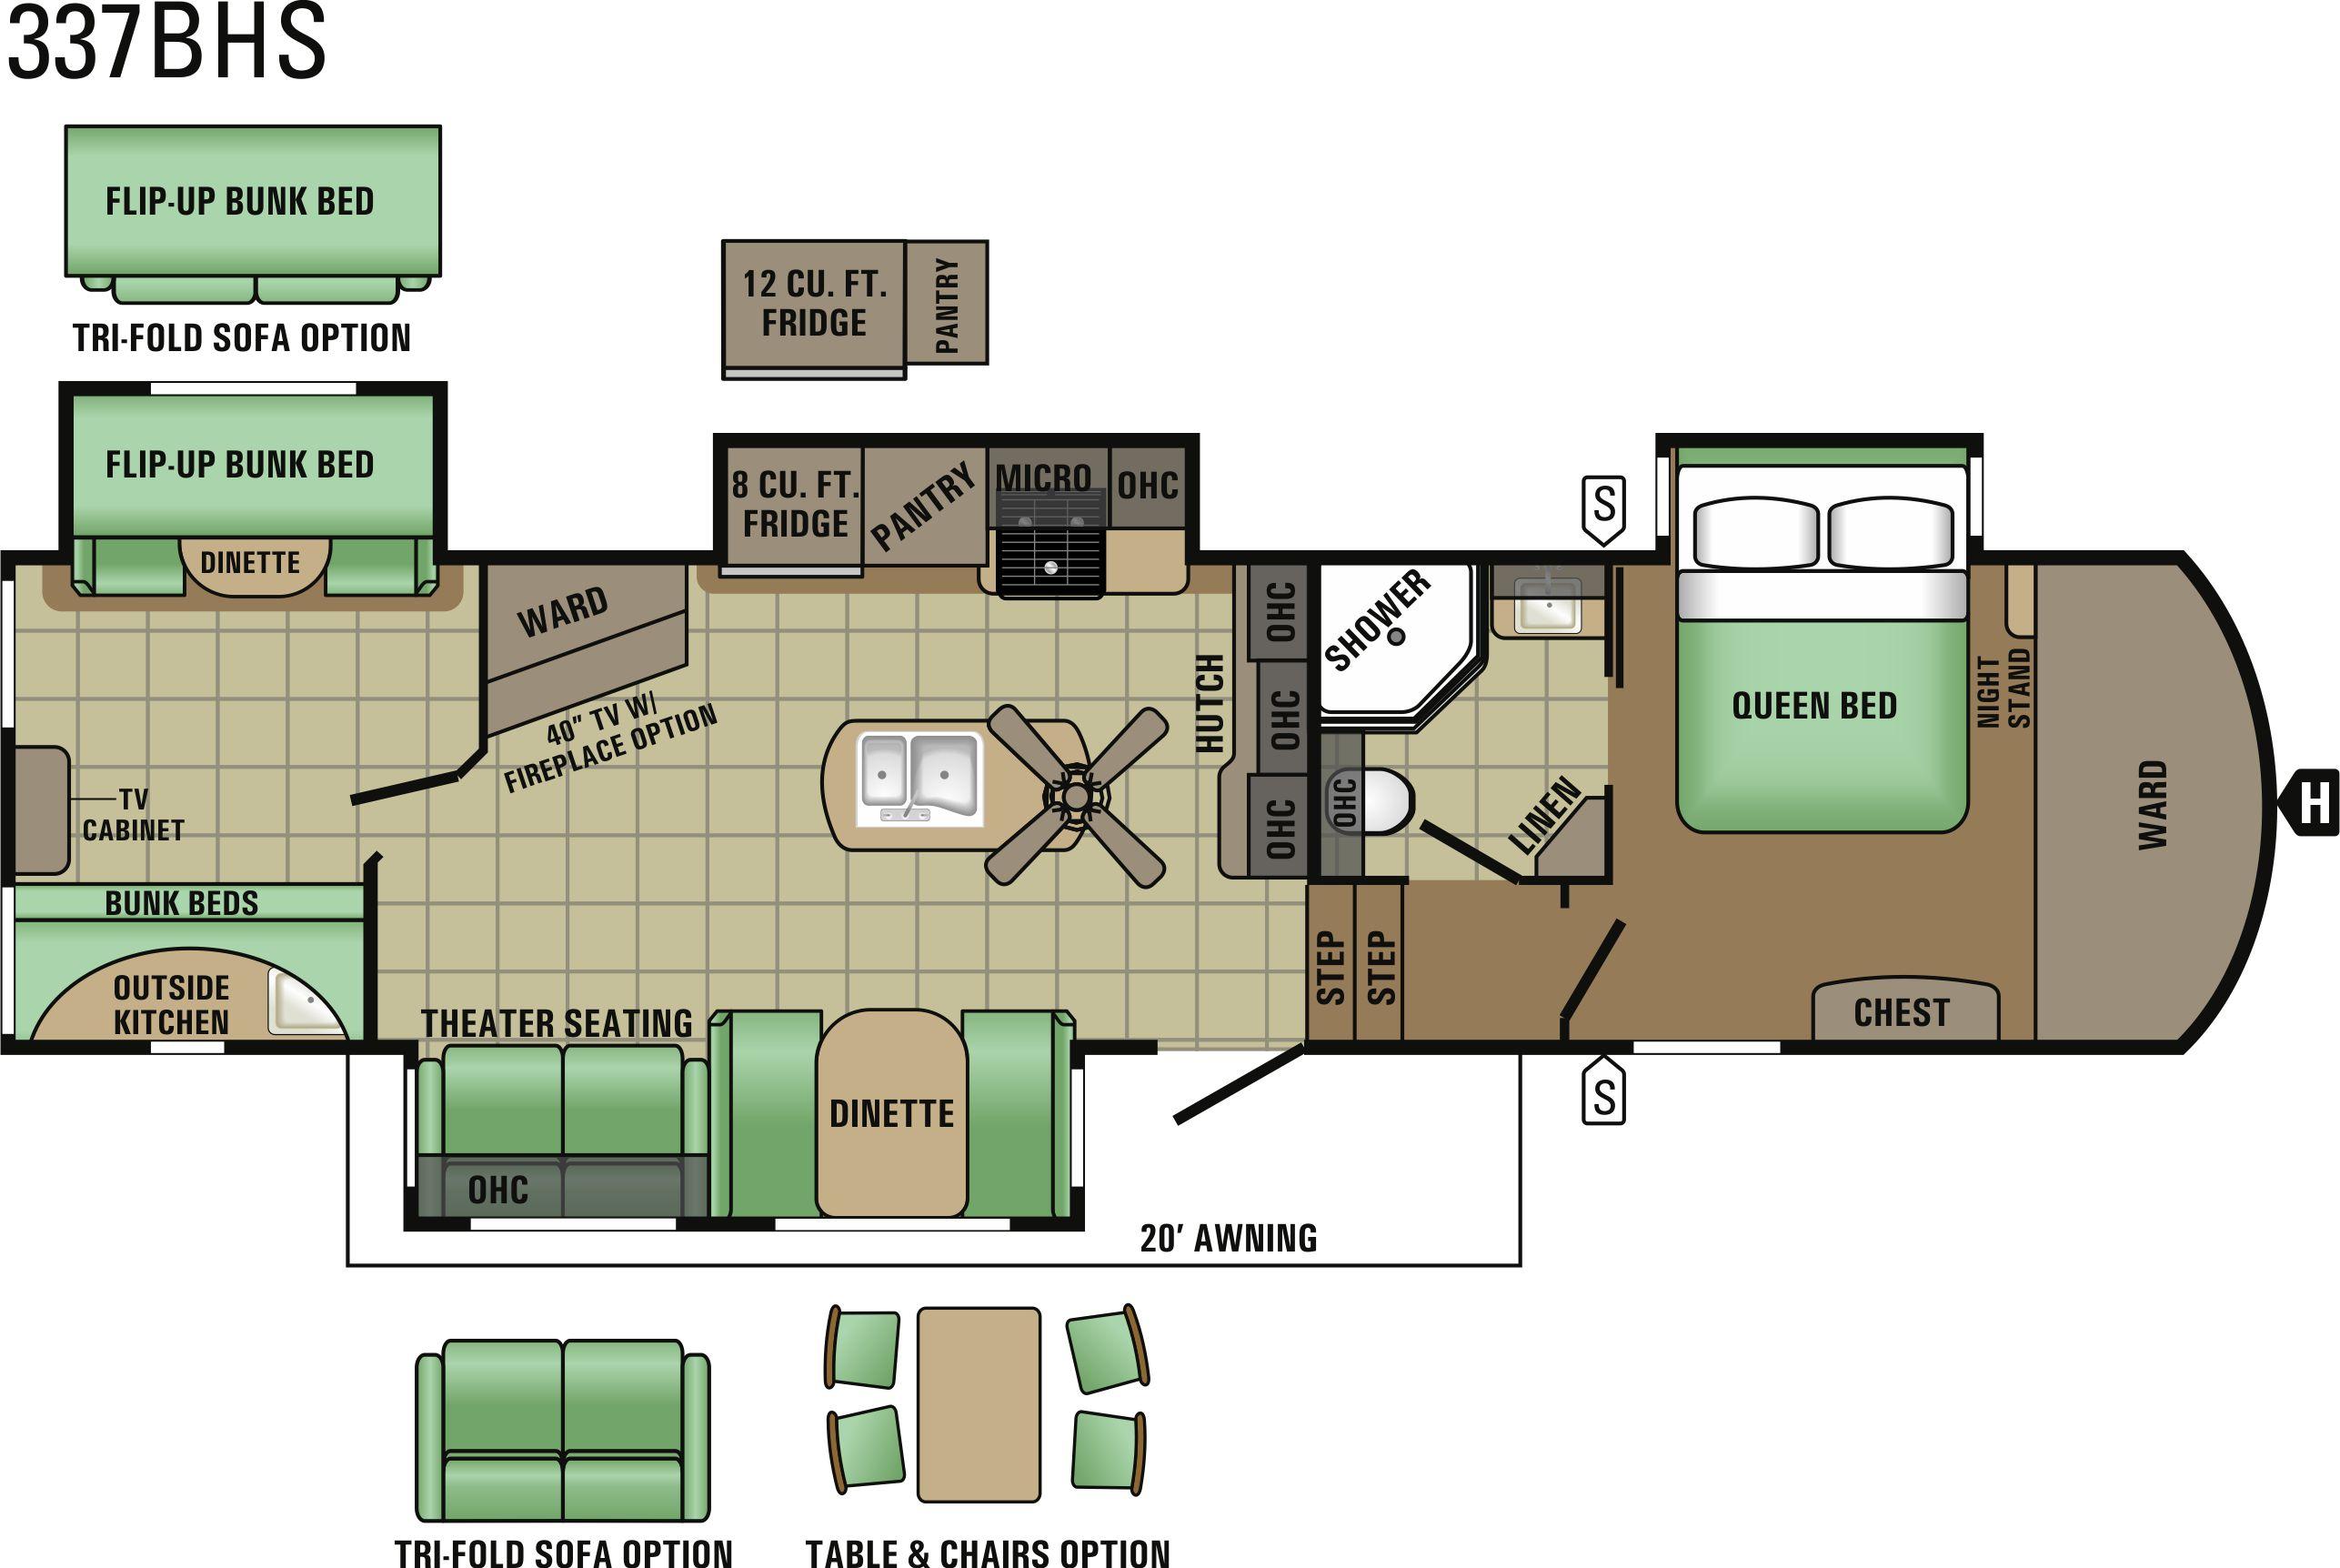 337BHS Floorplan